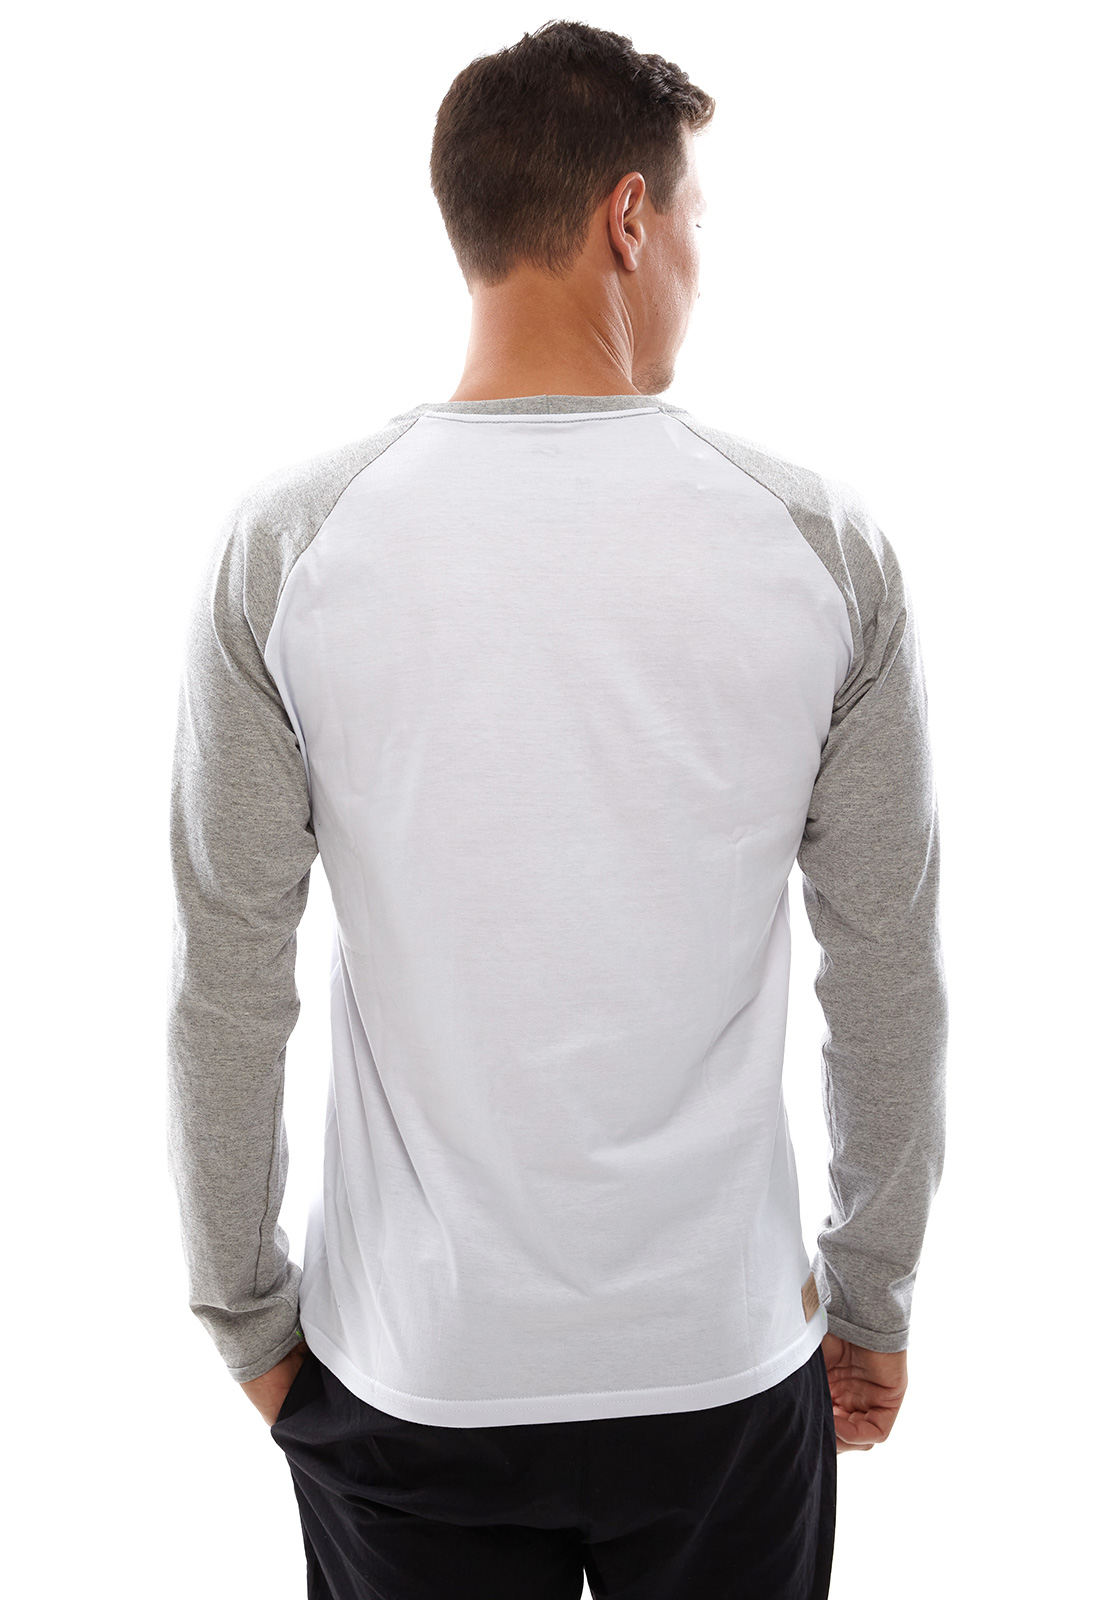 Camiseta Vida Marinha Manga Longa Branco/Cinza